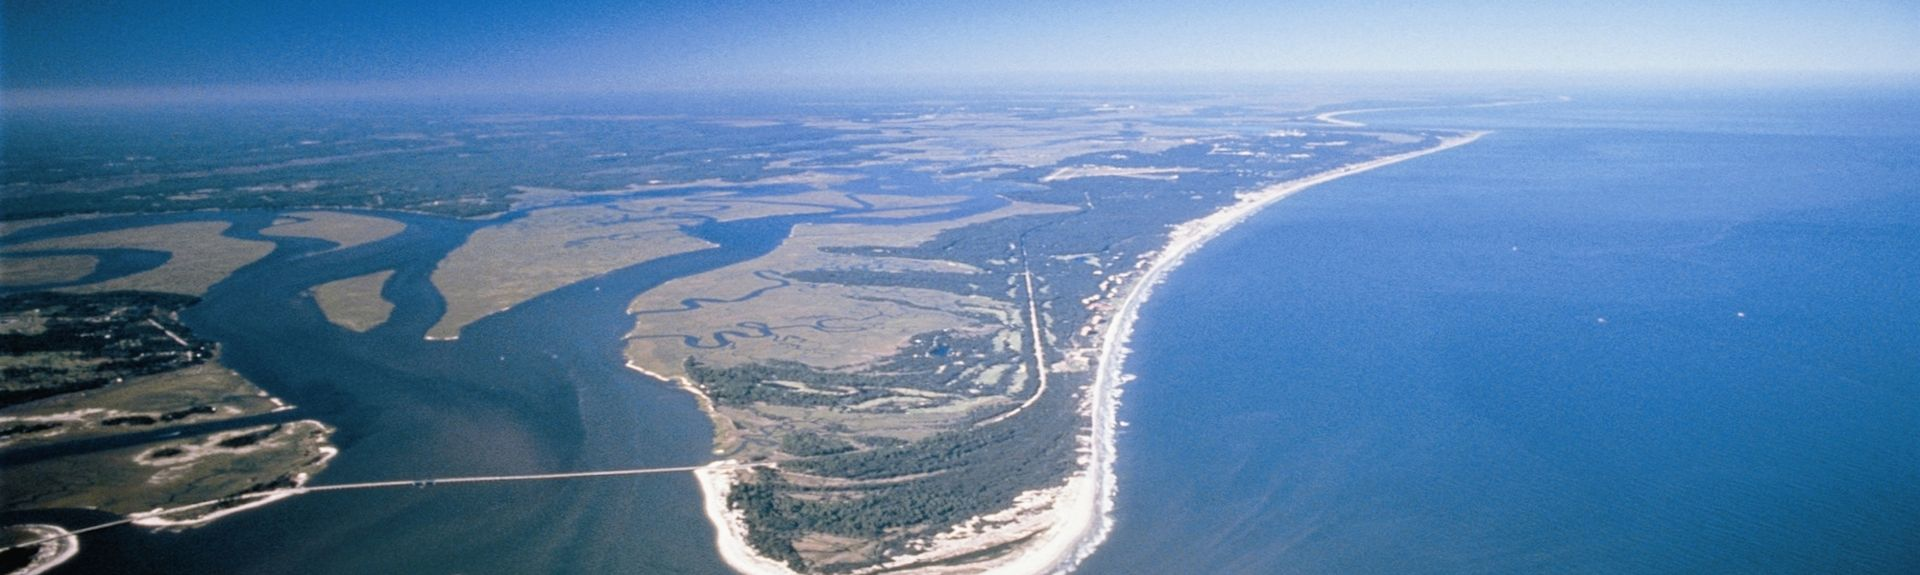 Ocean Place, Amelia City, FL, USA